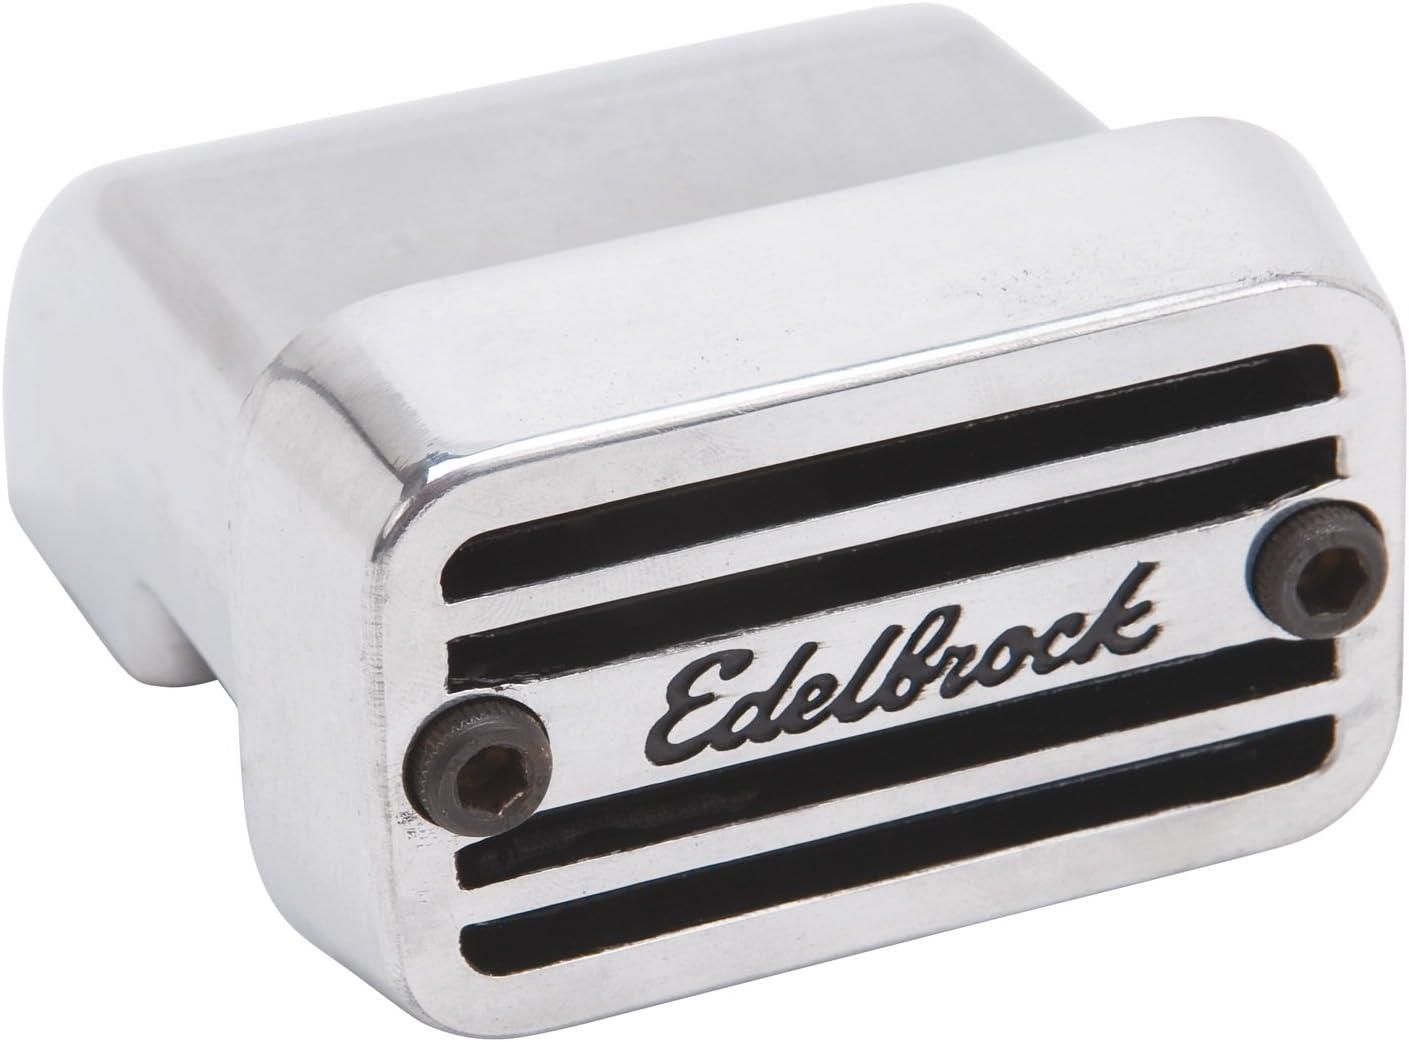 Edelbrock 4201 Elite Series Valve Cover Breather